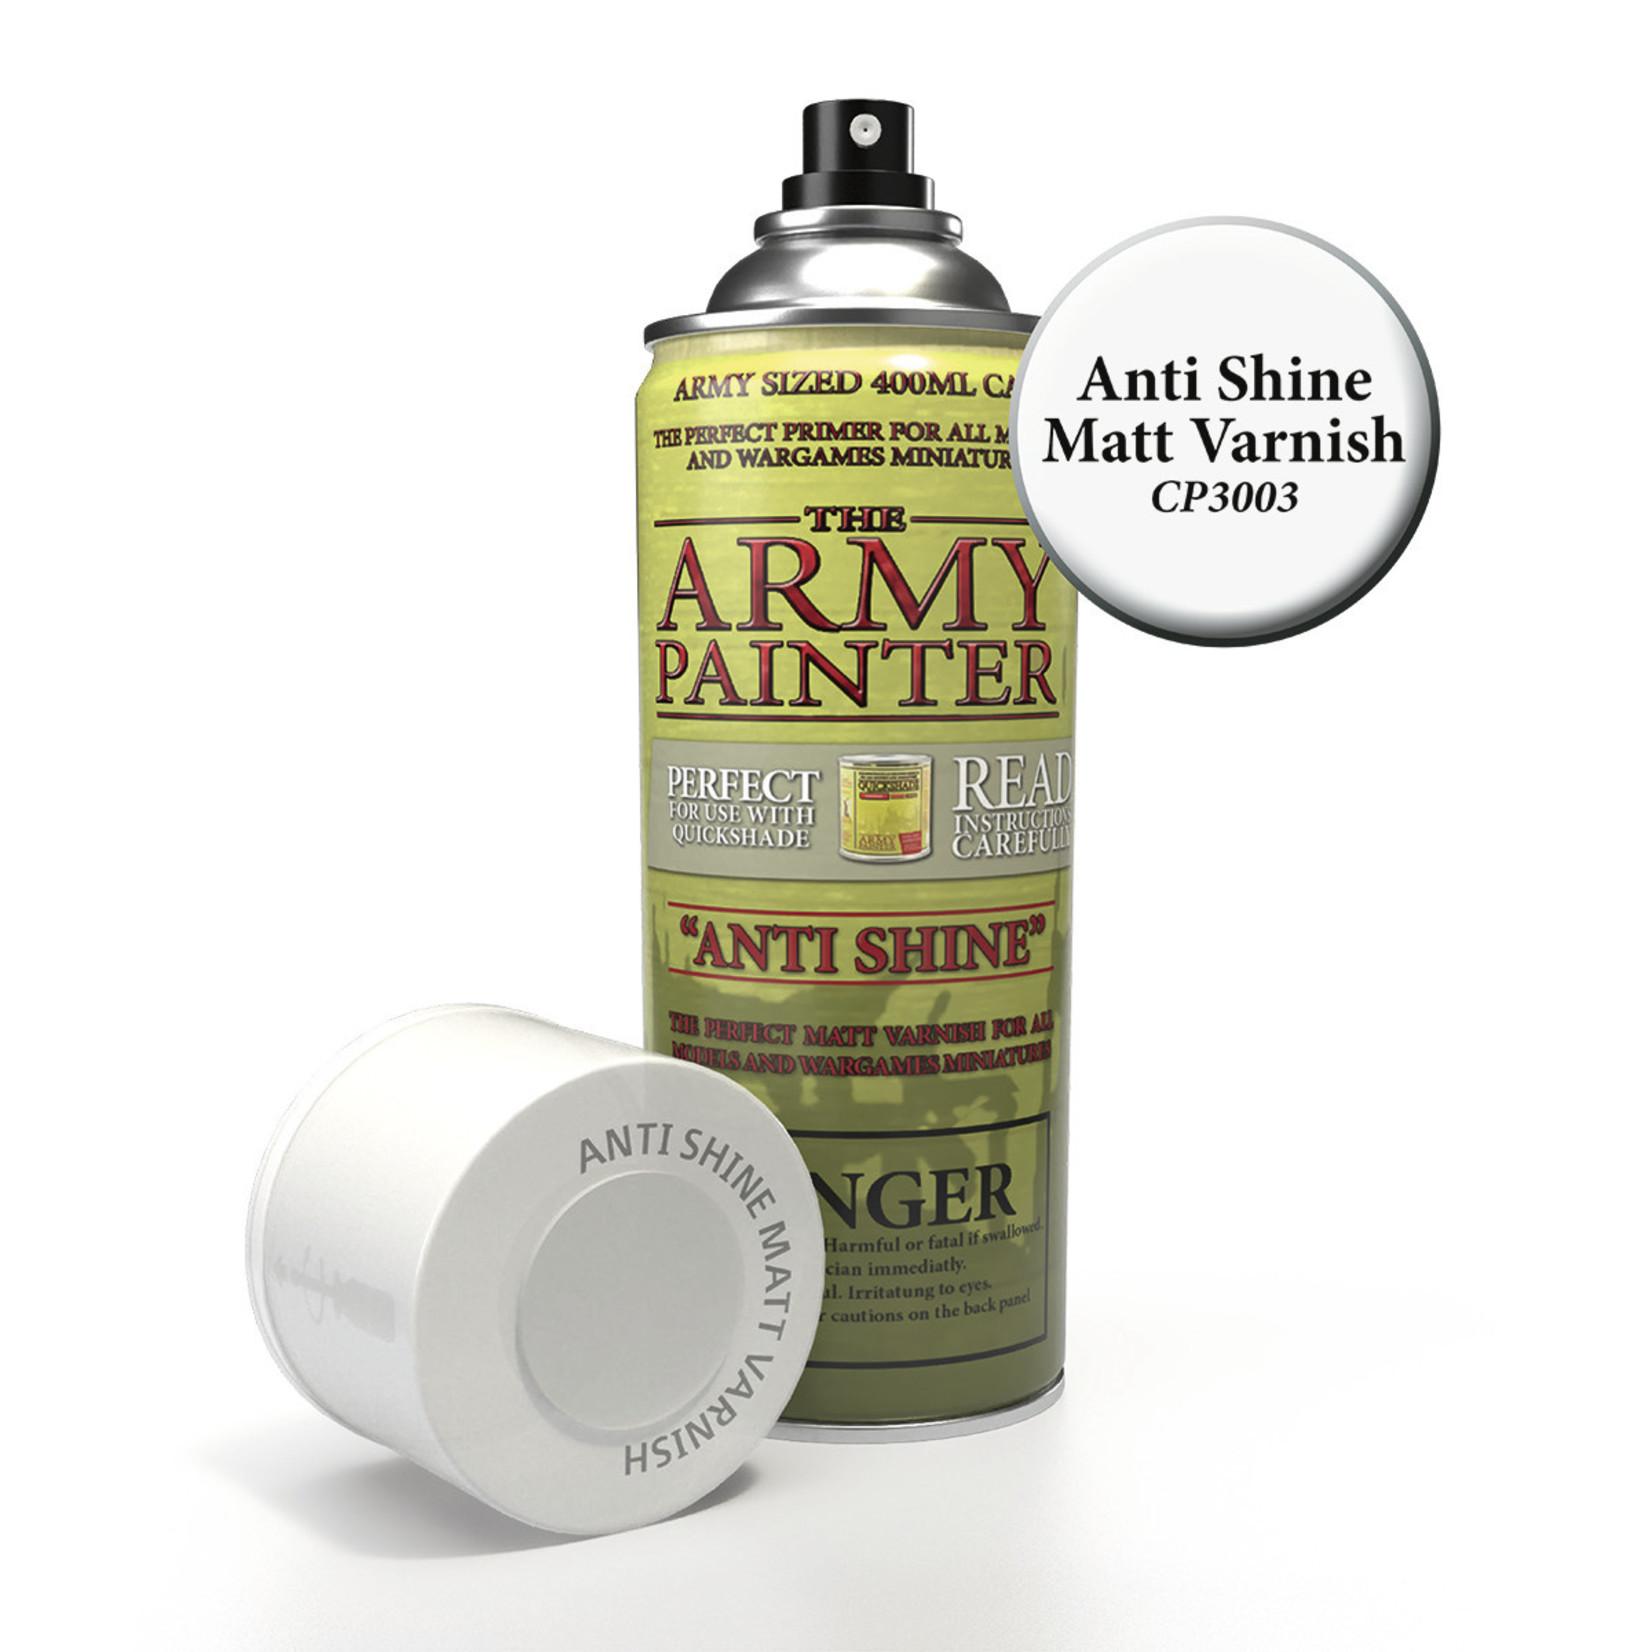 The Army Painter The Army Painter: Effects:  Anti-Shine Matt Varnish spray